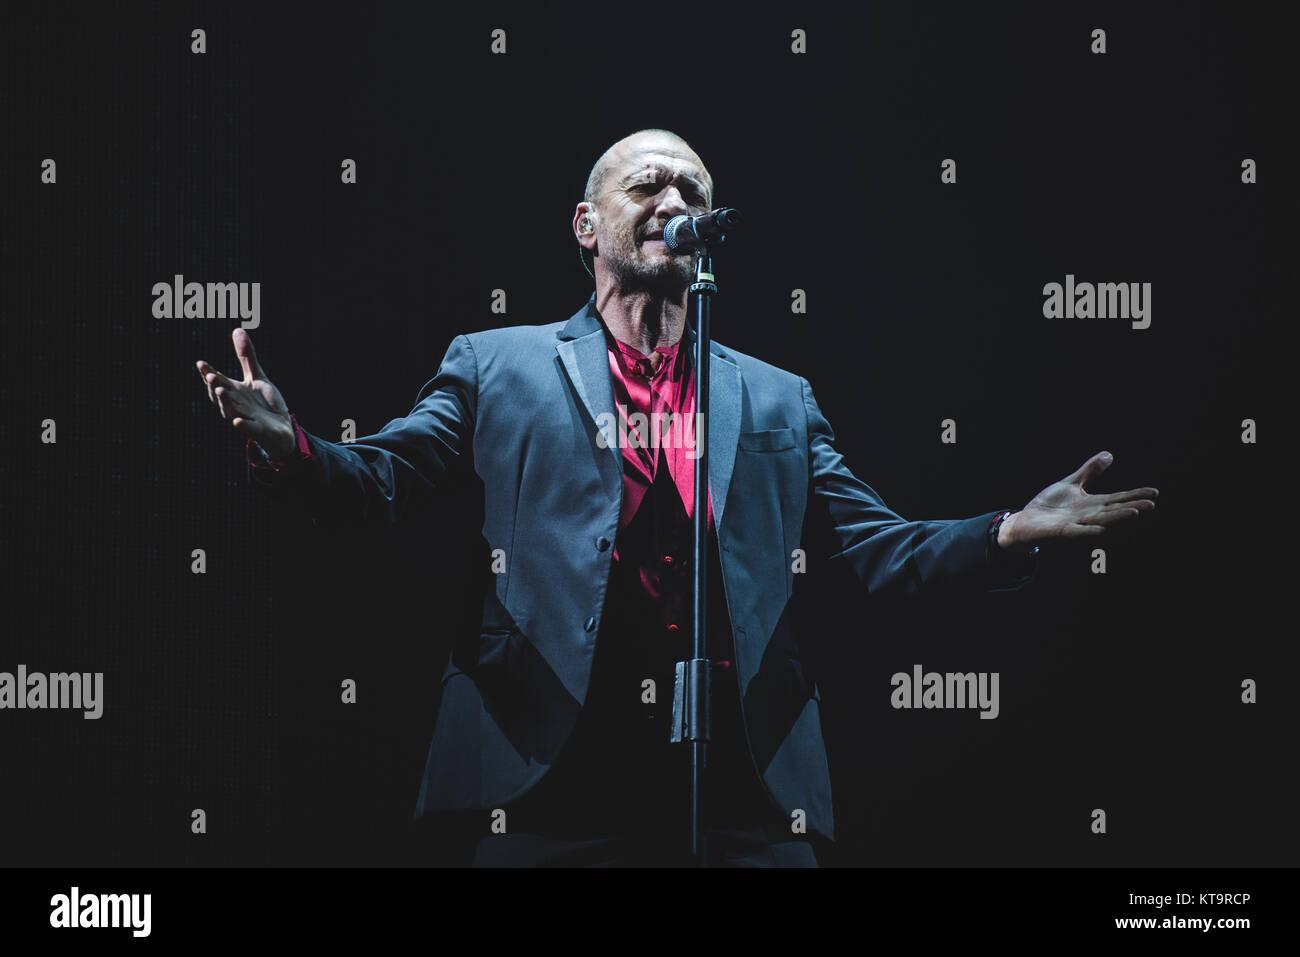 Turin, Italy. 21st Dec, 2017. Italy, 2017 December 21st: The Italian singer and song writer Biagio Antonacci performing Stock Photo